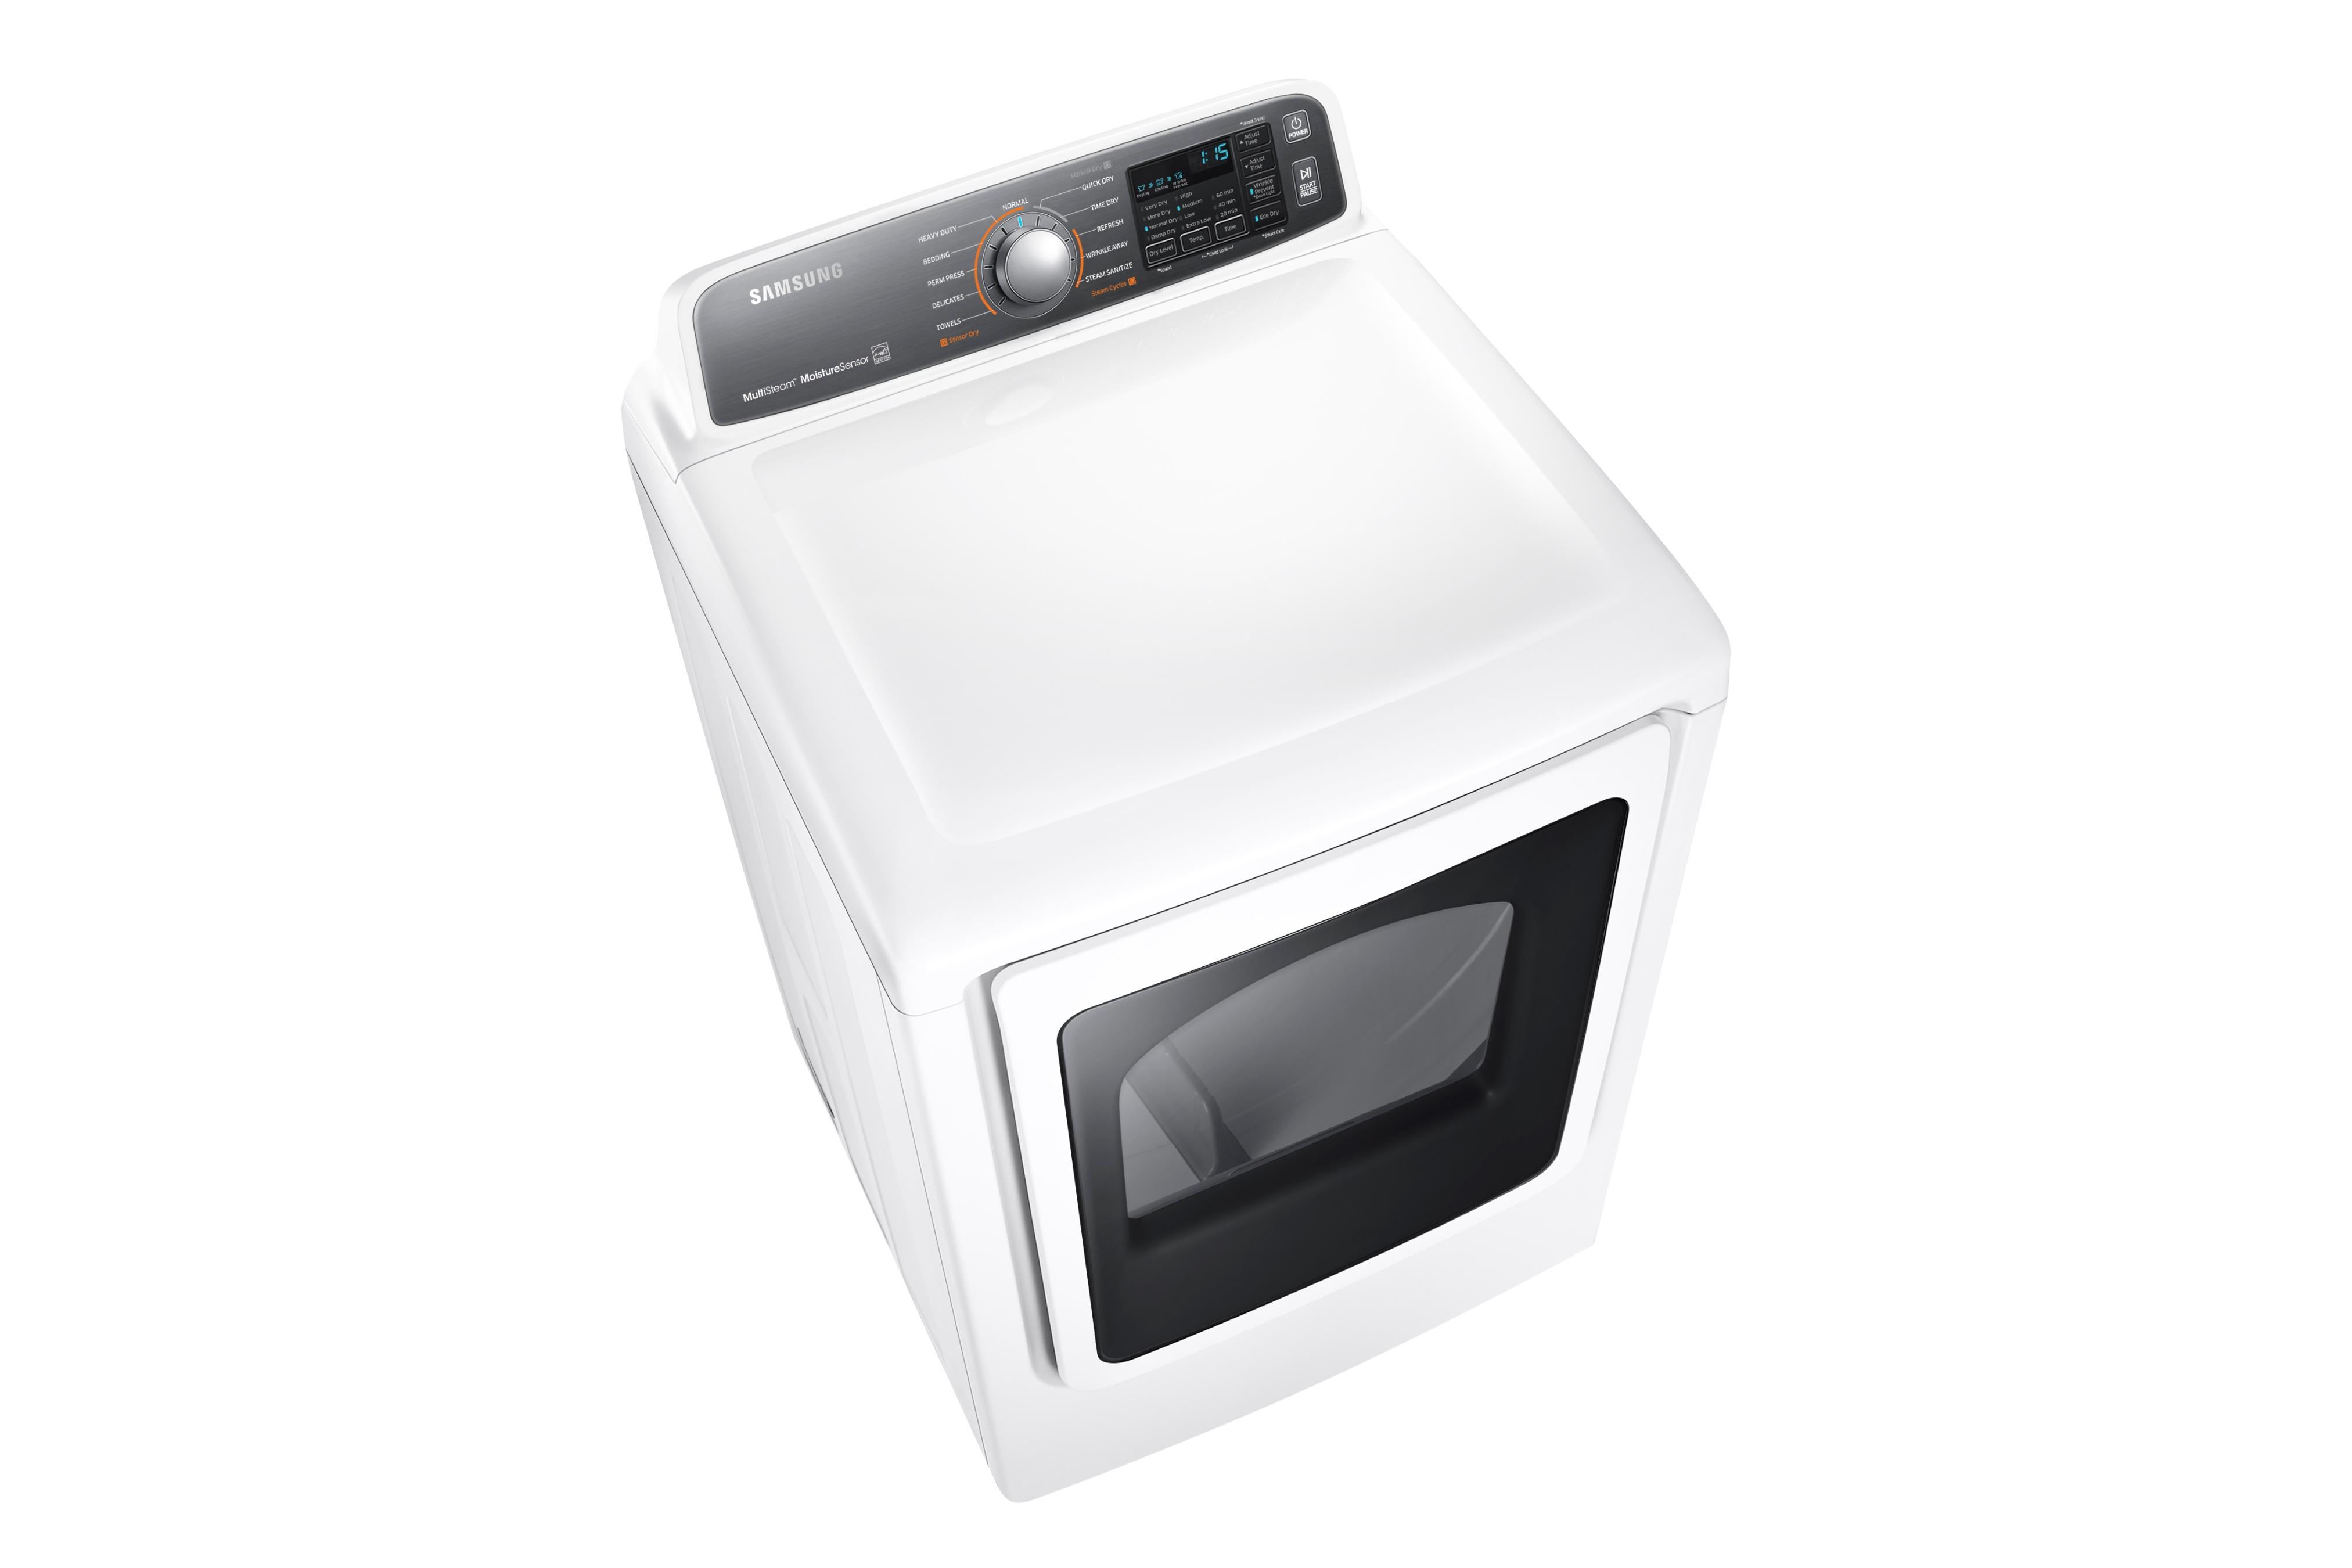 Samsung DV48J7700EW 7.4 cu. ft. Electric Dryer